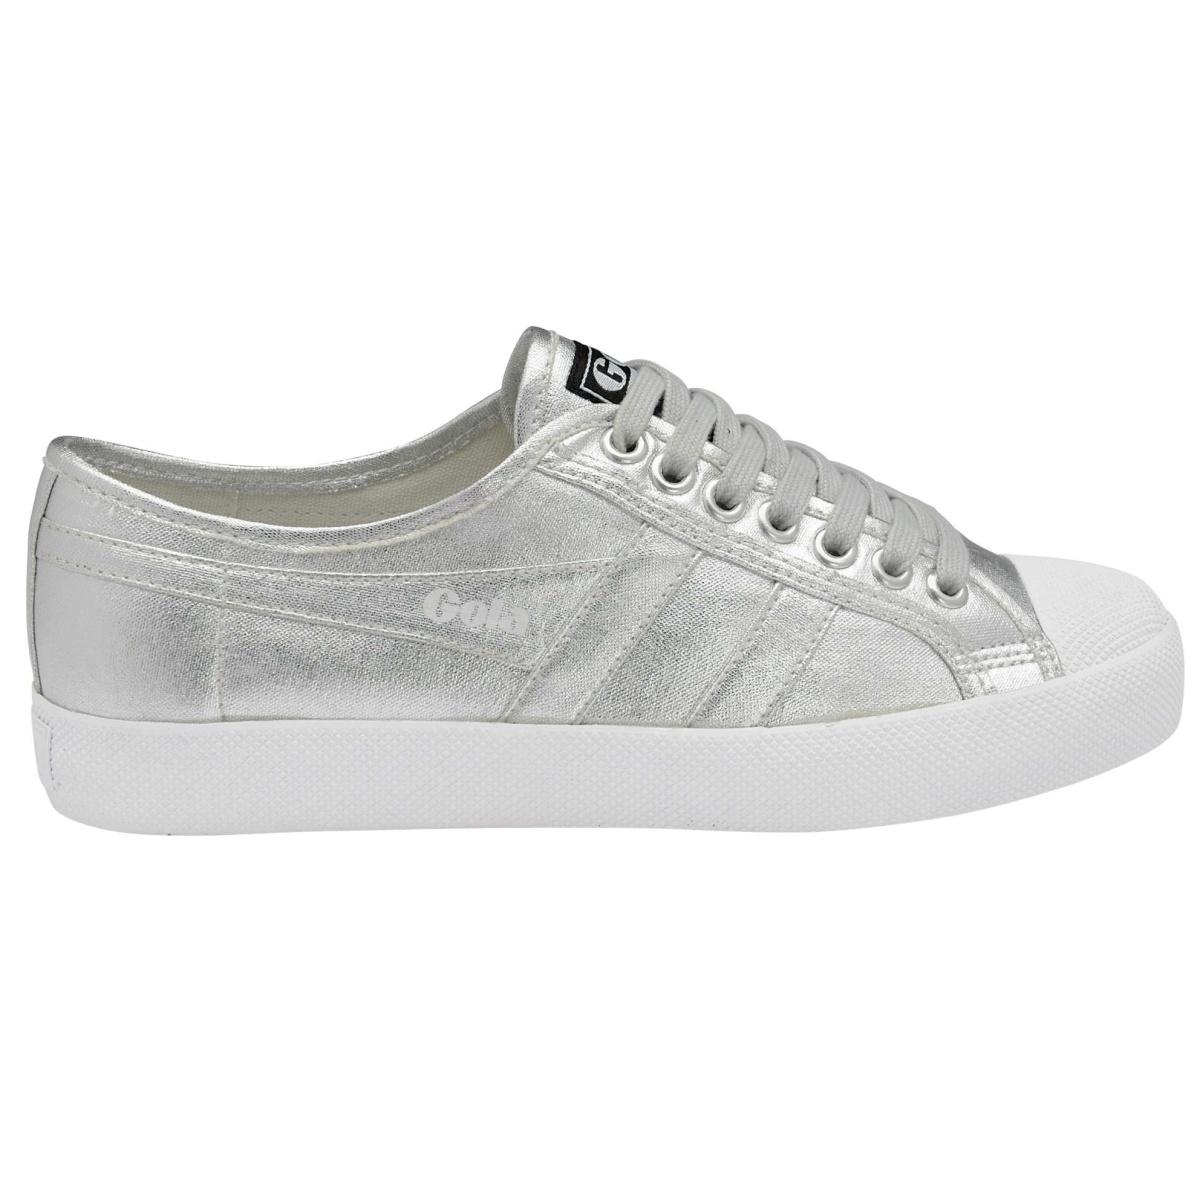 Coaster Online Silber Gola Damen Bestellen Sneaker Metallic Canvas TcJF1lK